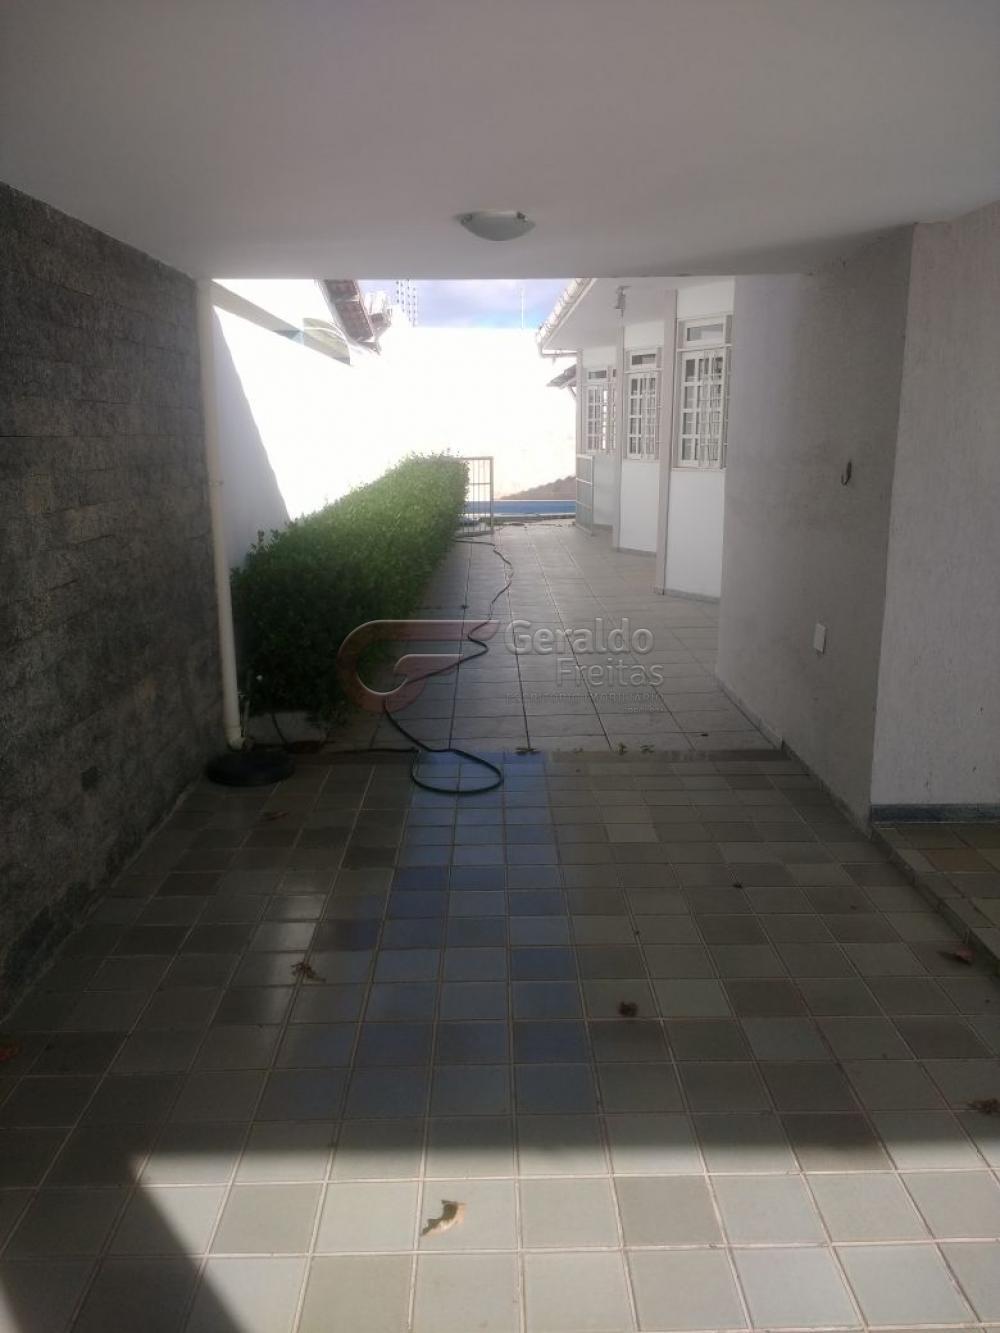 Comprar Casas / Condominio em Maceió apenas R$ 550.000,00 - Foto 7